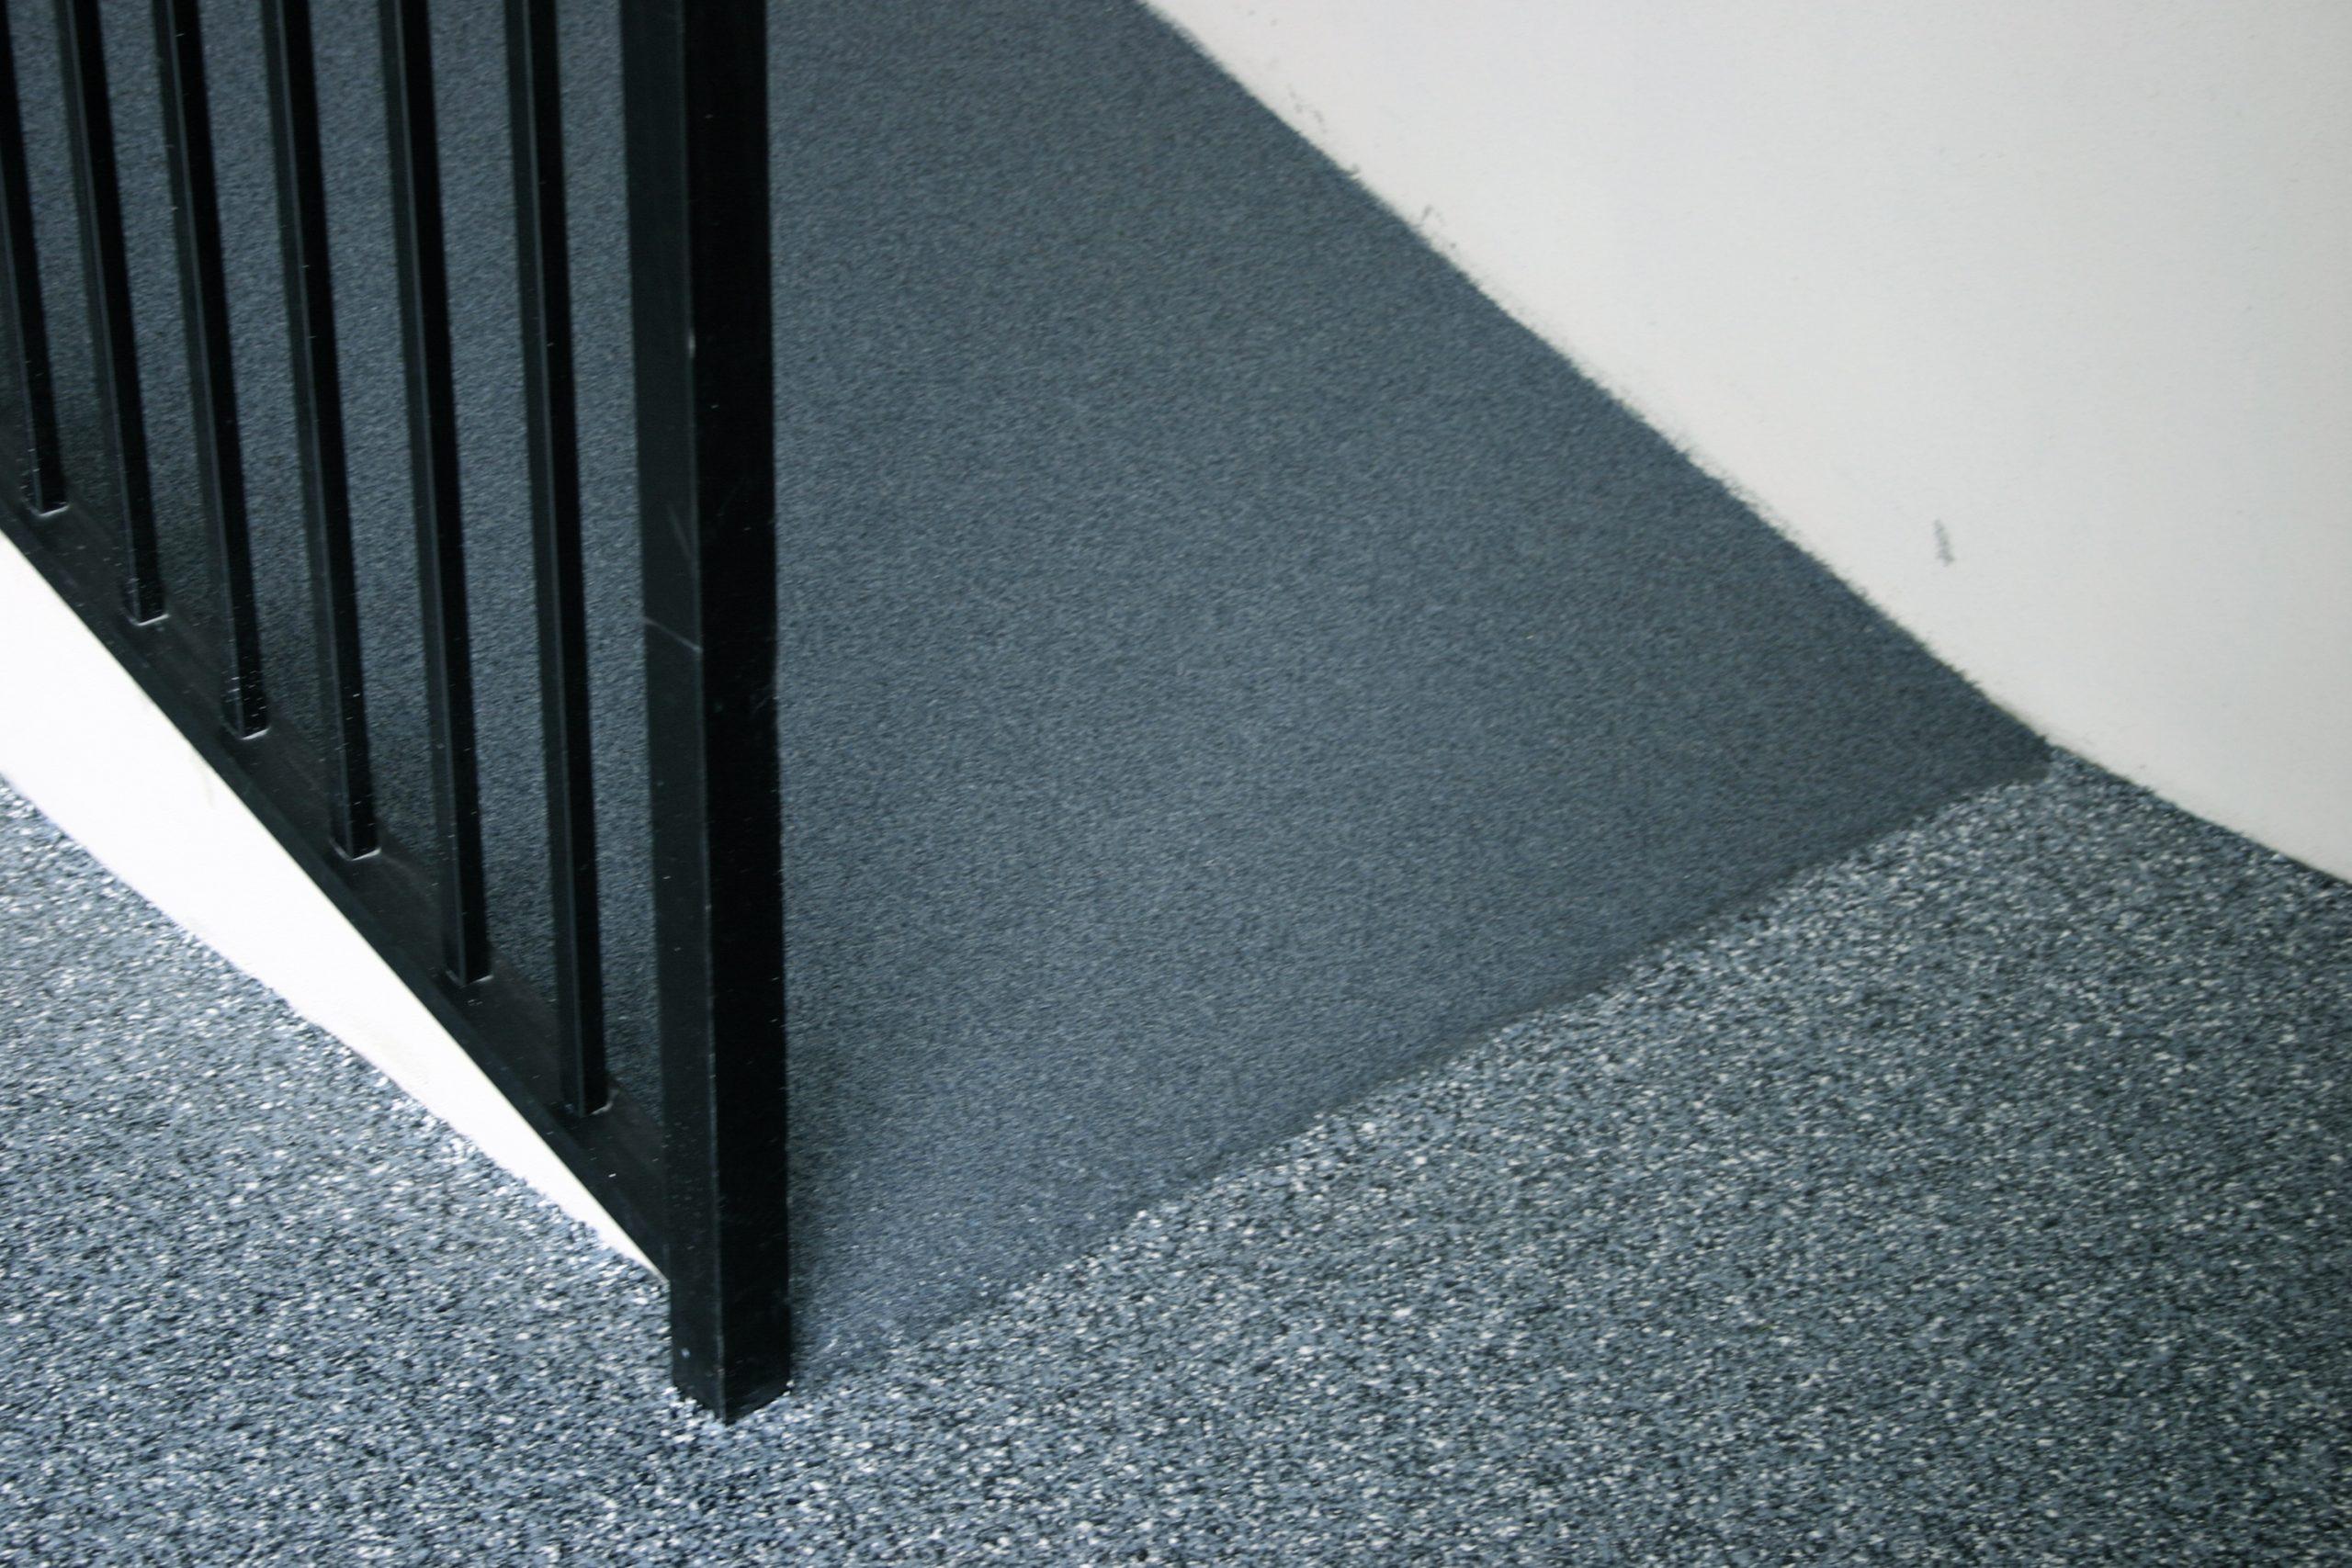 Garage Doctors Easy Clean Flooring in Florida roy-3